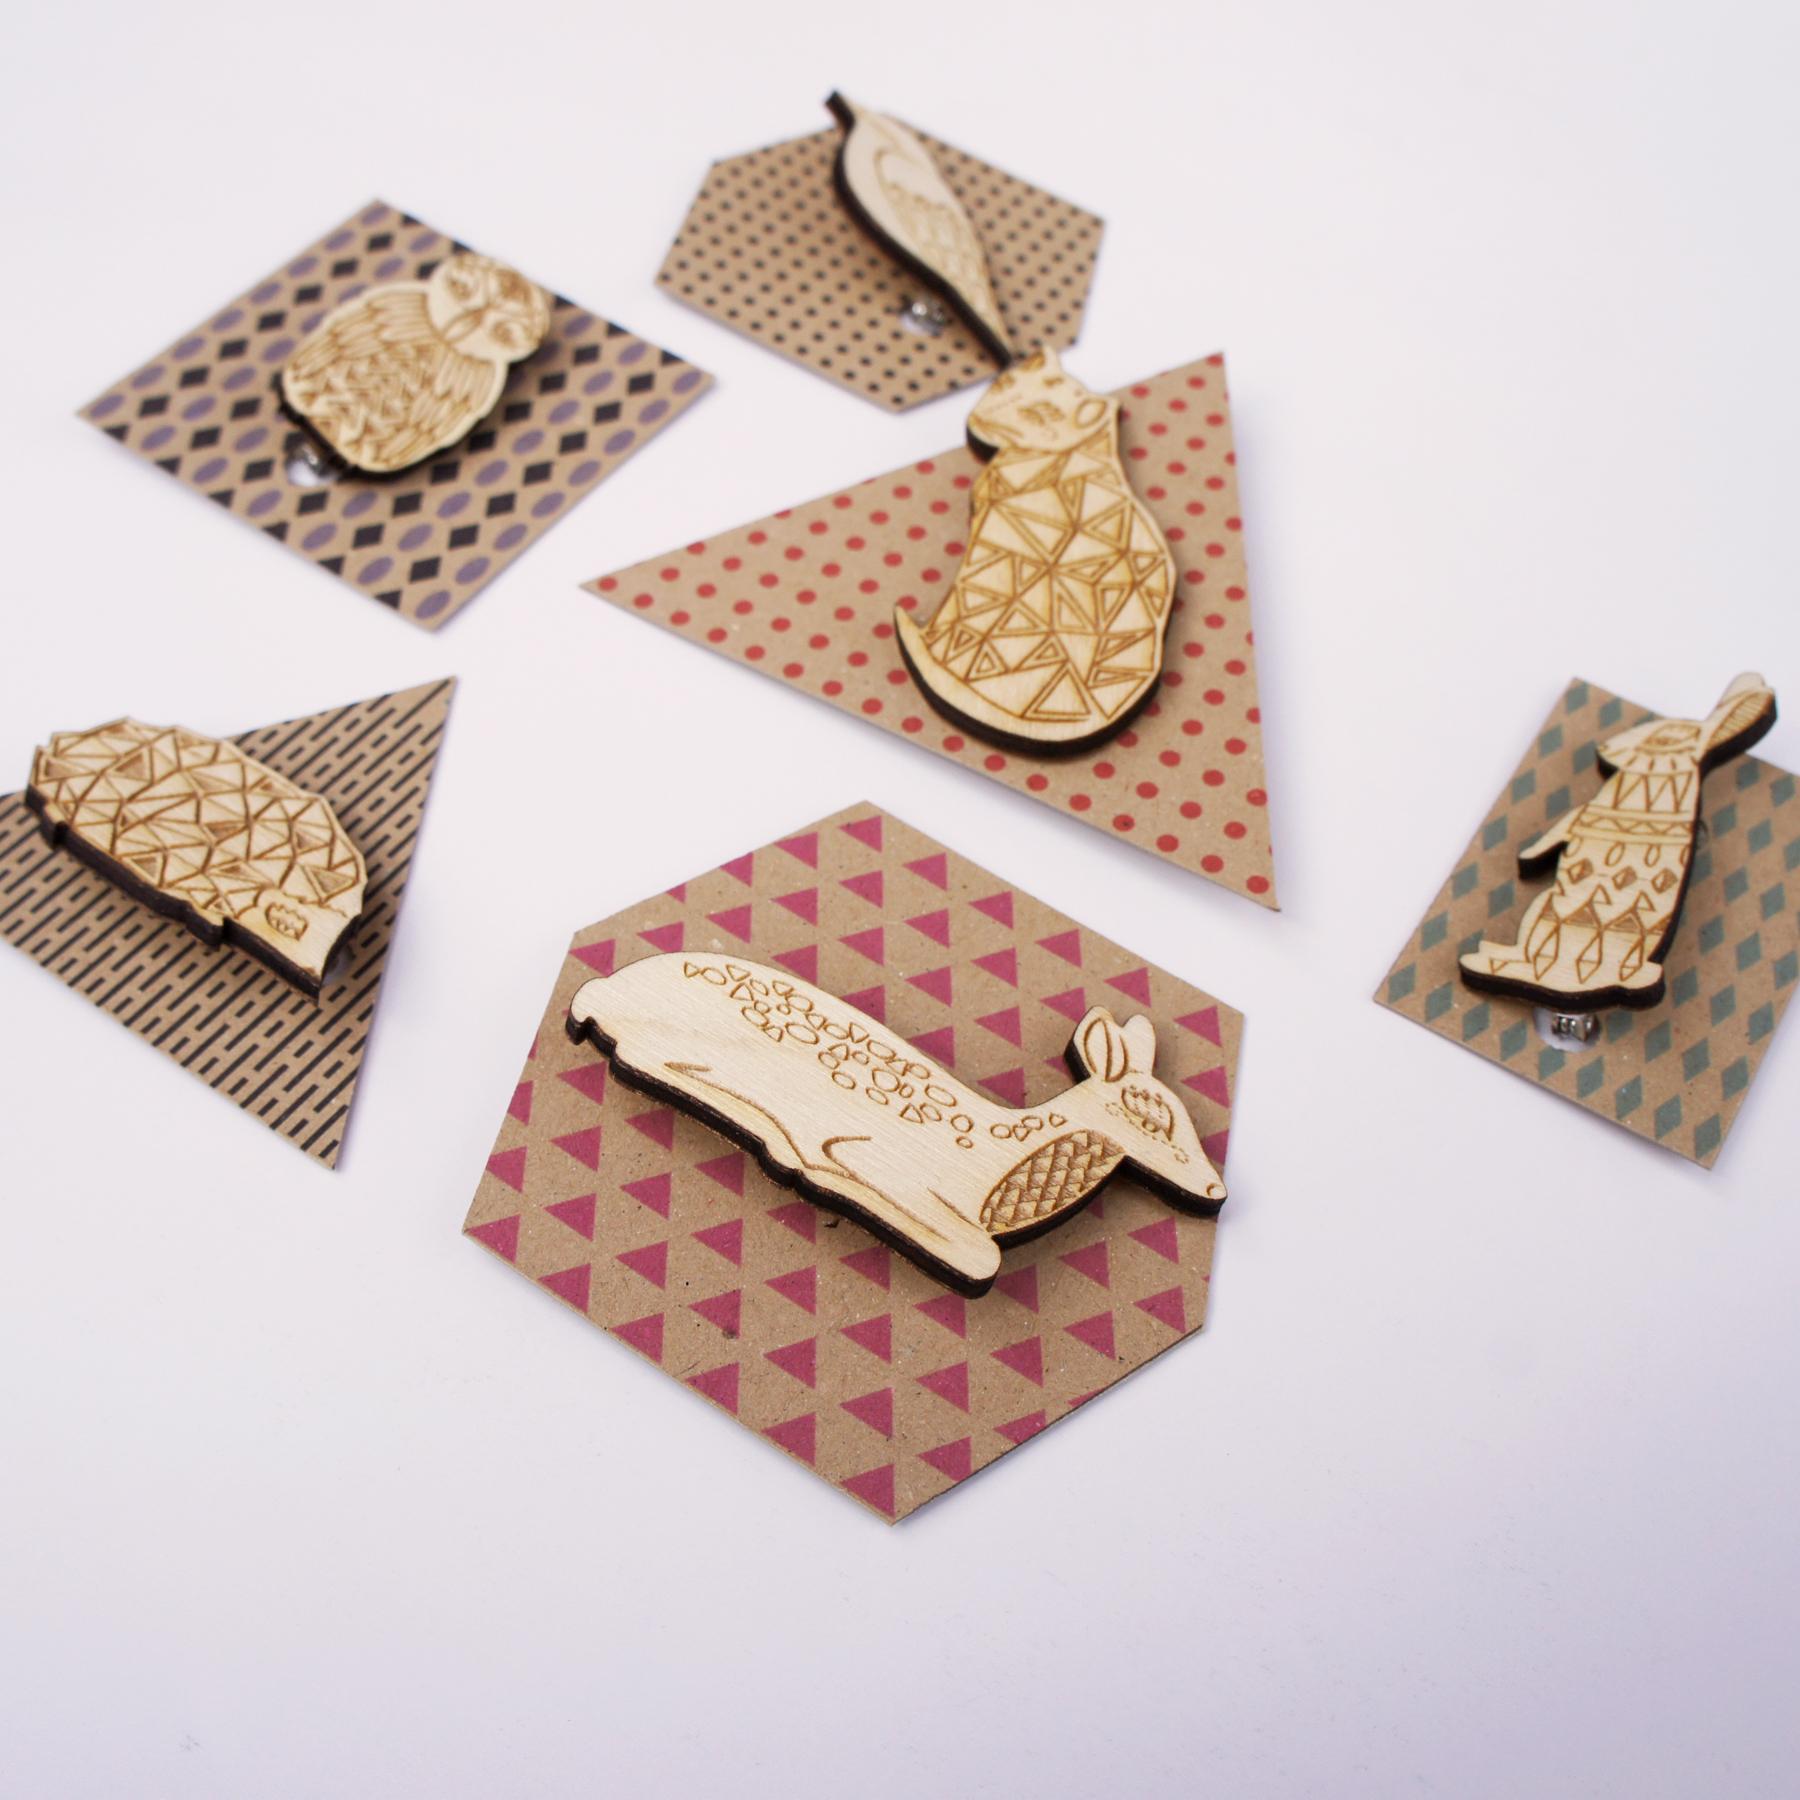 Kirsty Baynham laser engraved brooches